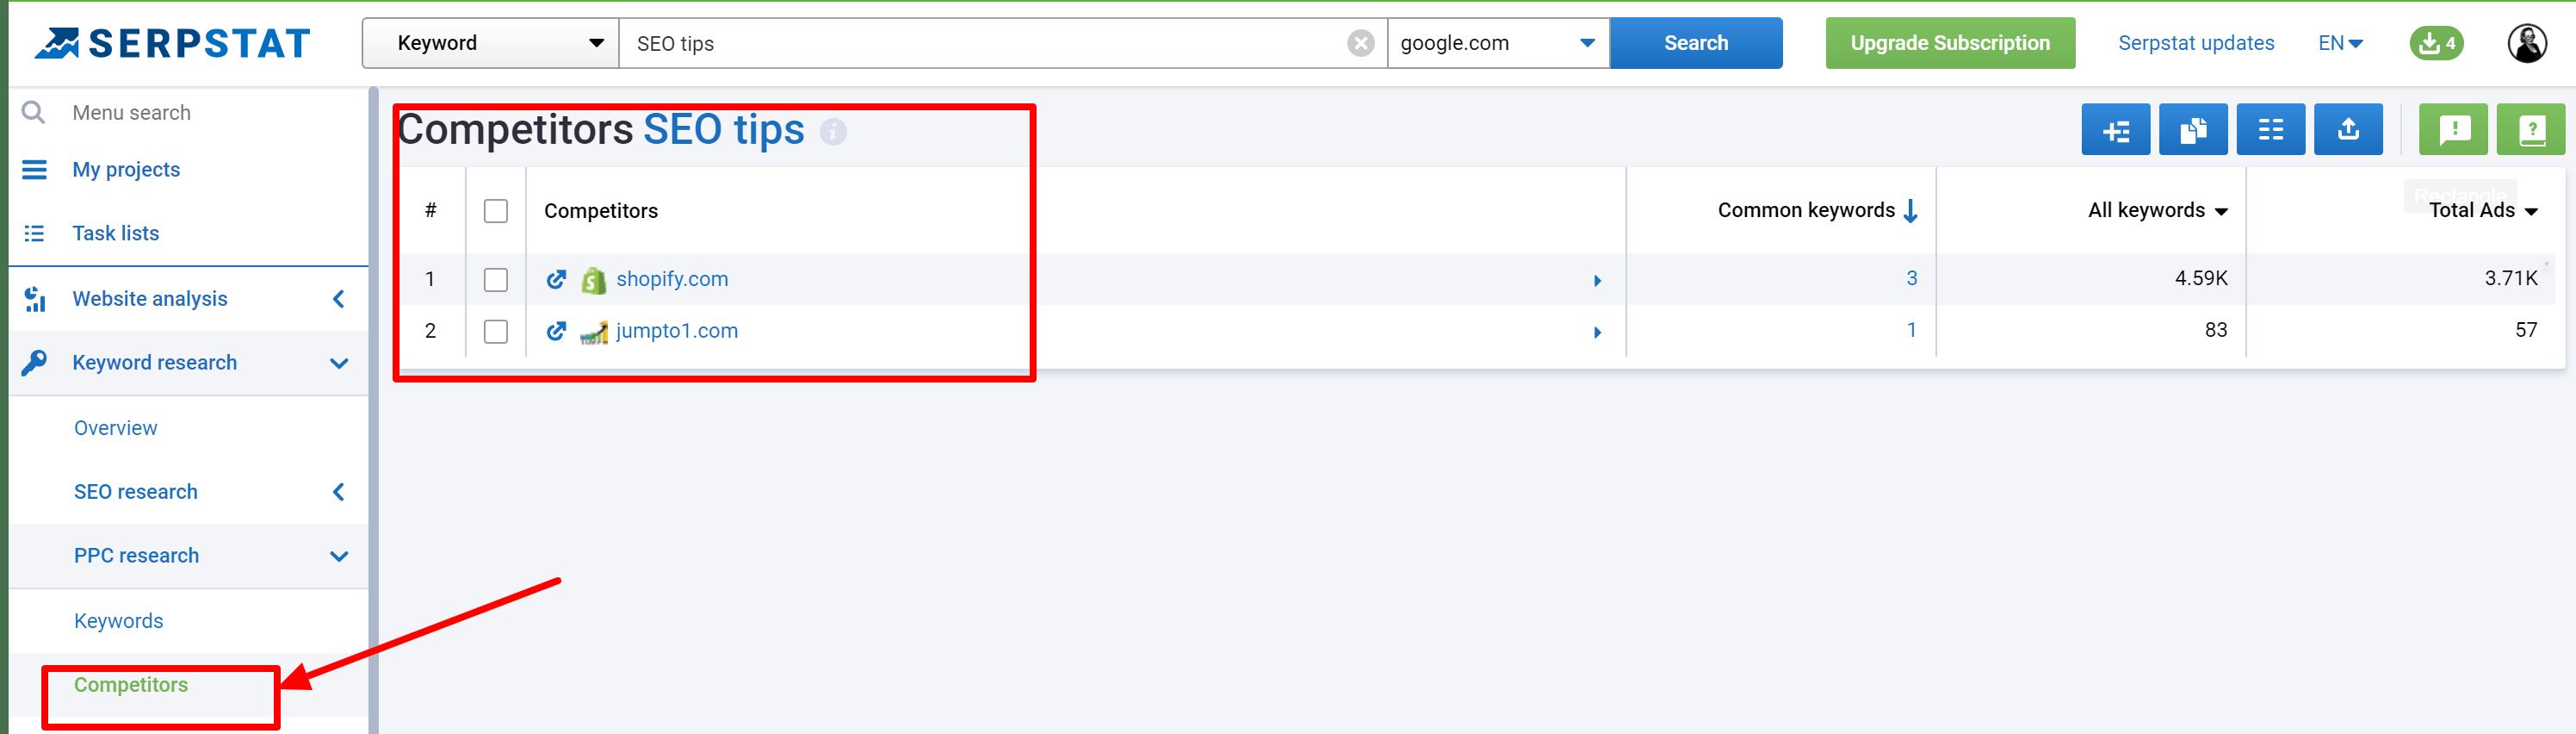 Serpstat PPC tool